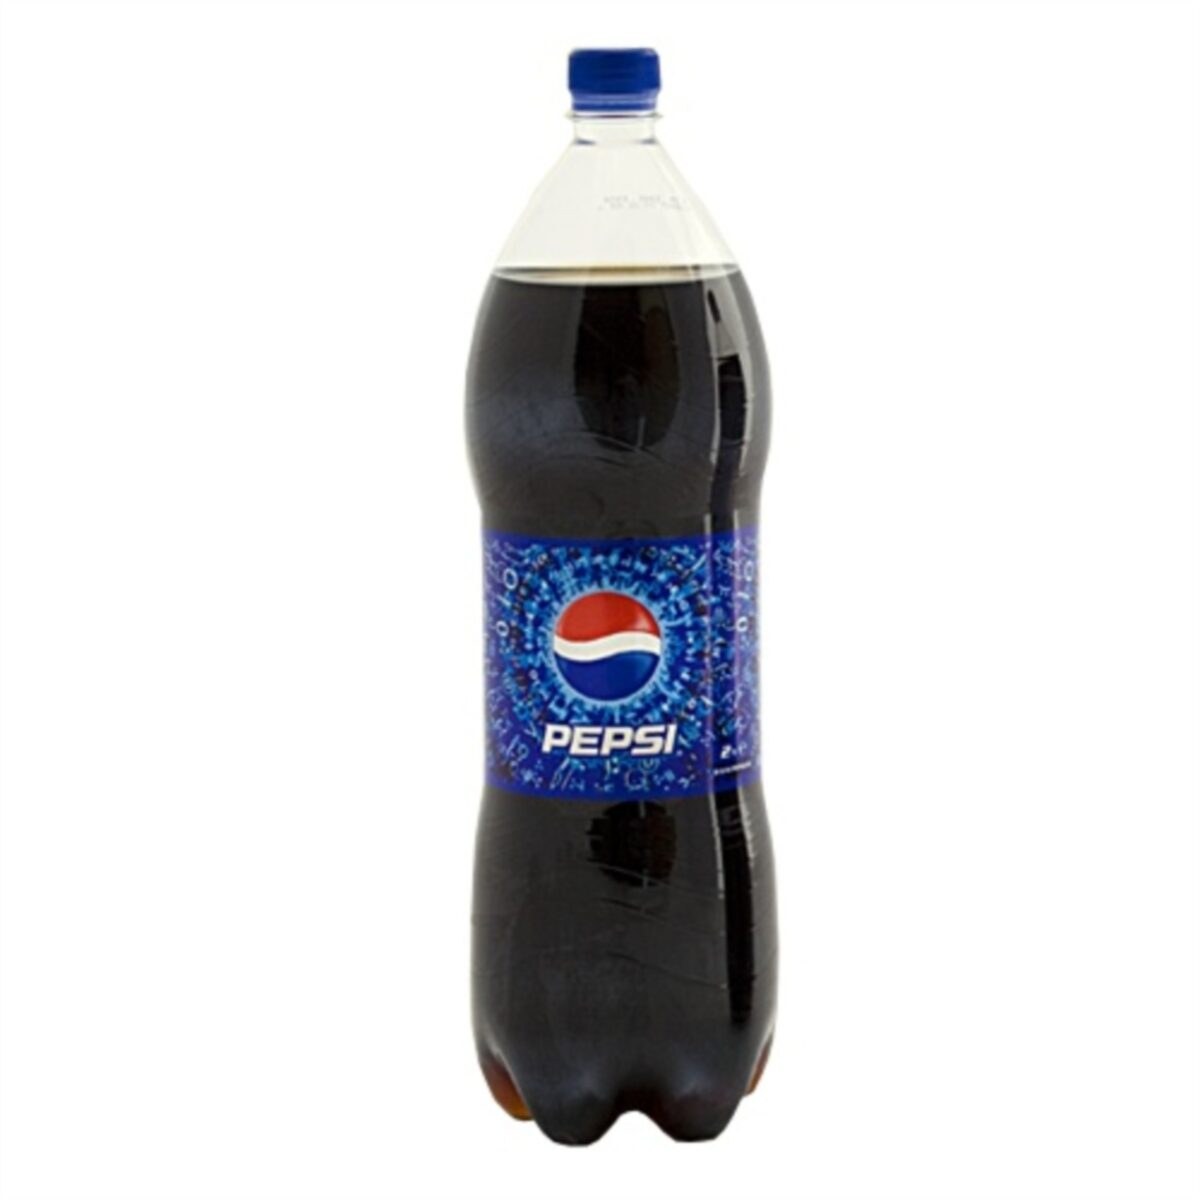 Pepsi2,25 л.